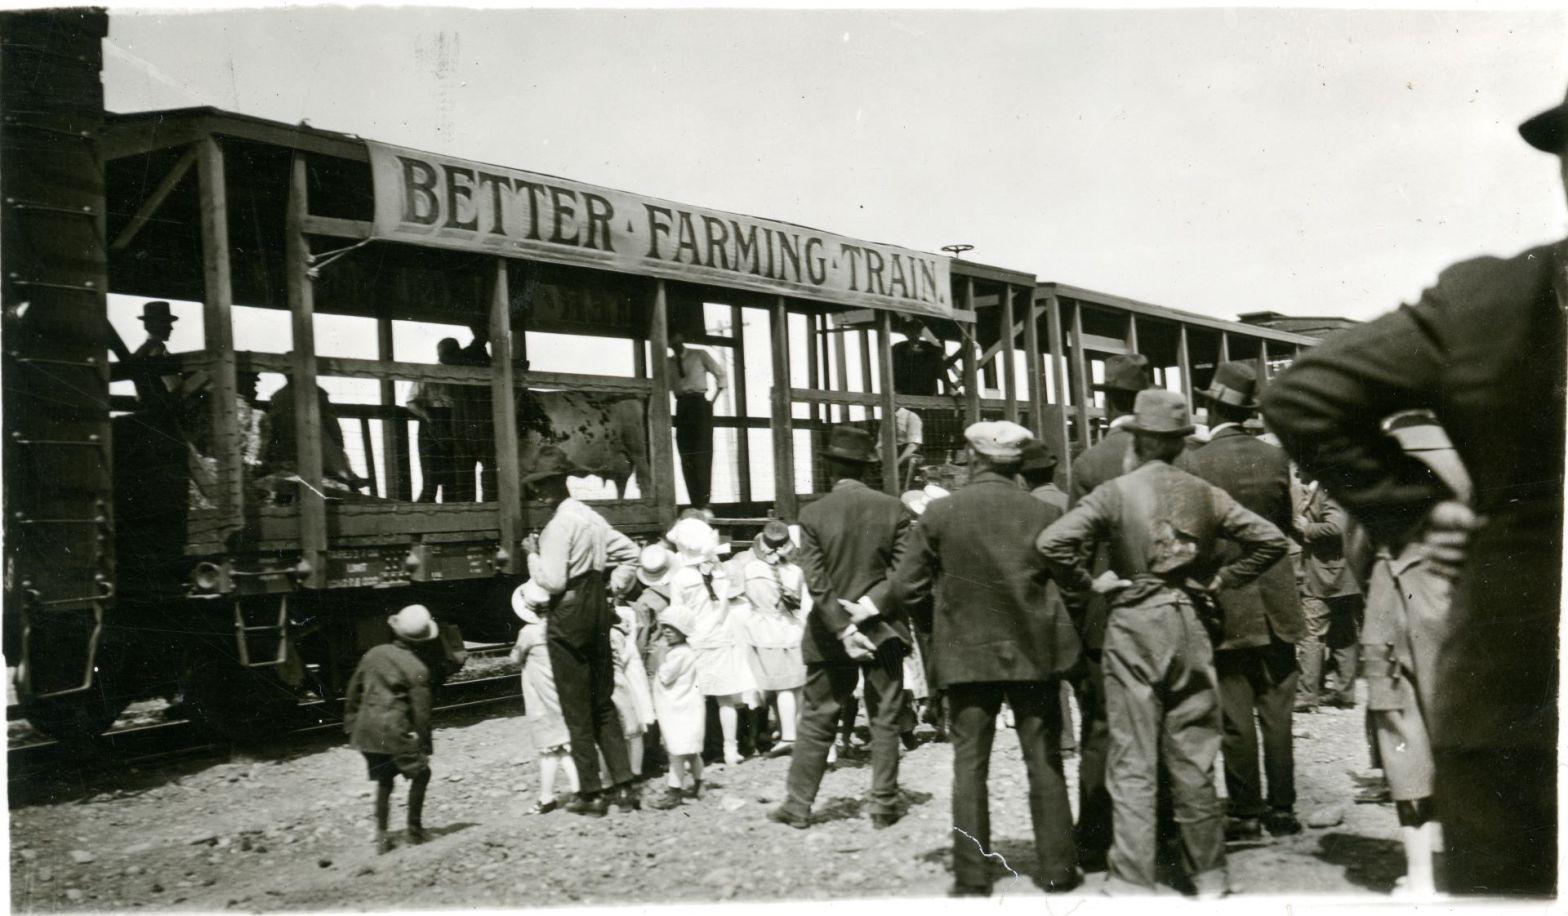 The Better Farming Train